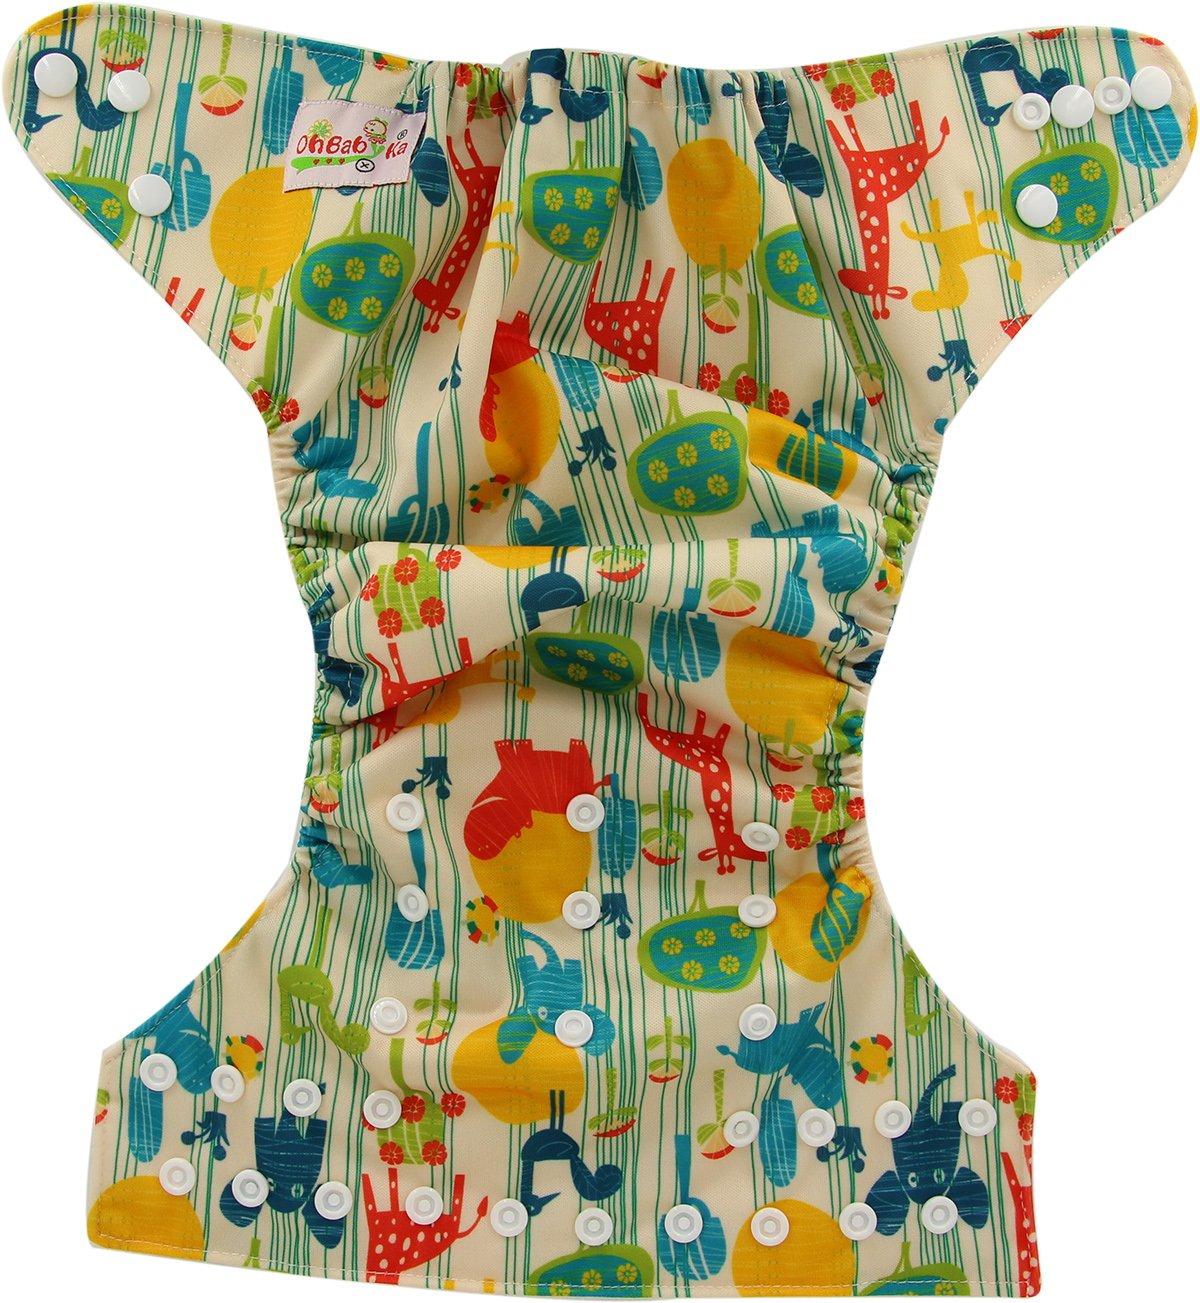 Ohbabyka Pañales unisex de tela estilo bolsillo para bebés con 1 tela interna de gamuza suave OB101-Green Animal Talla:talla única: Amazon.es: Bebé